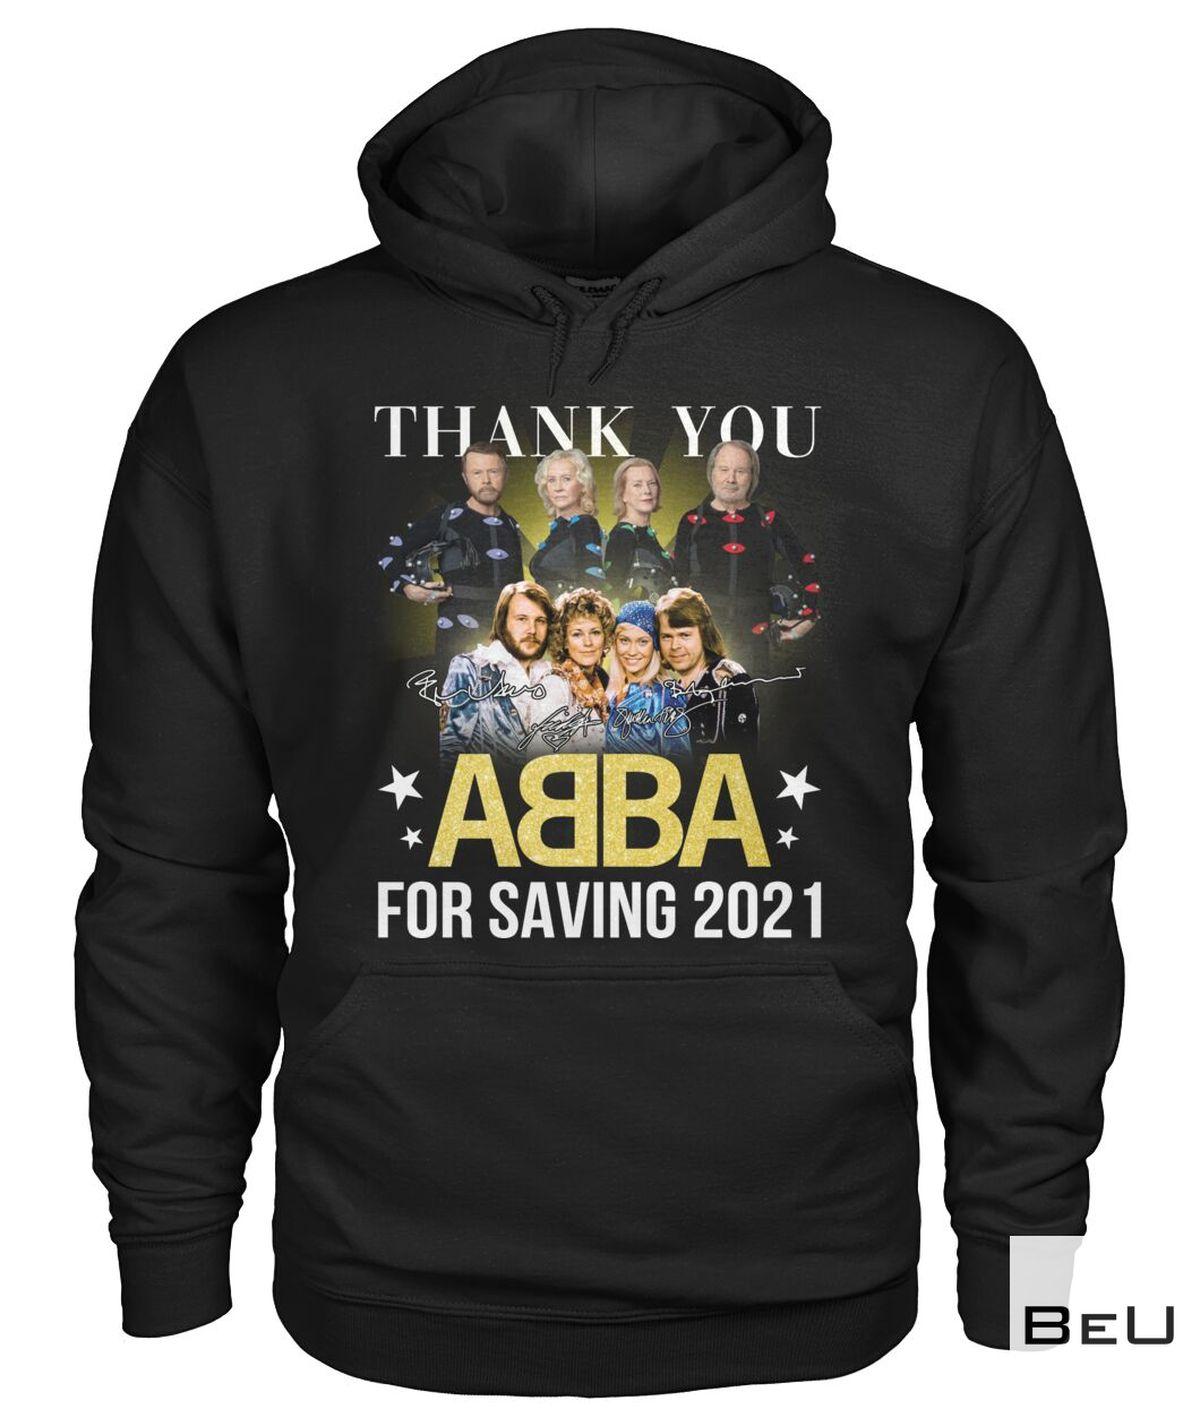 Thank You Abba For Saving 2021 Shirt a